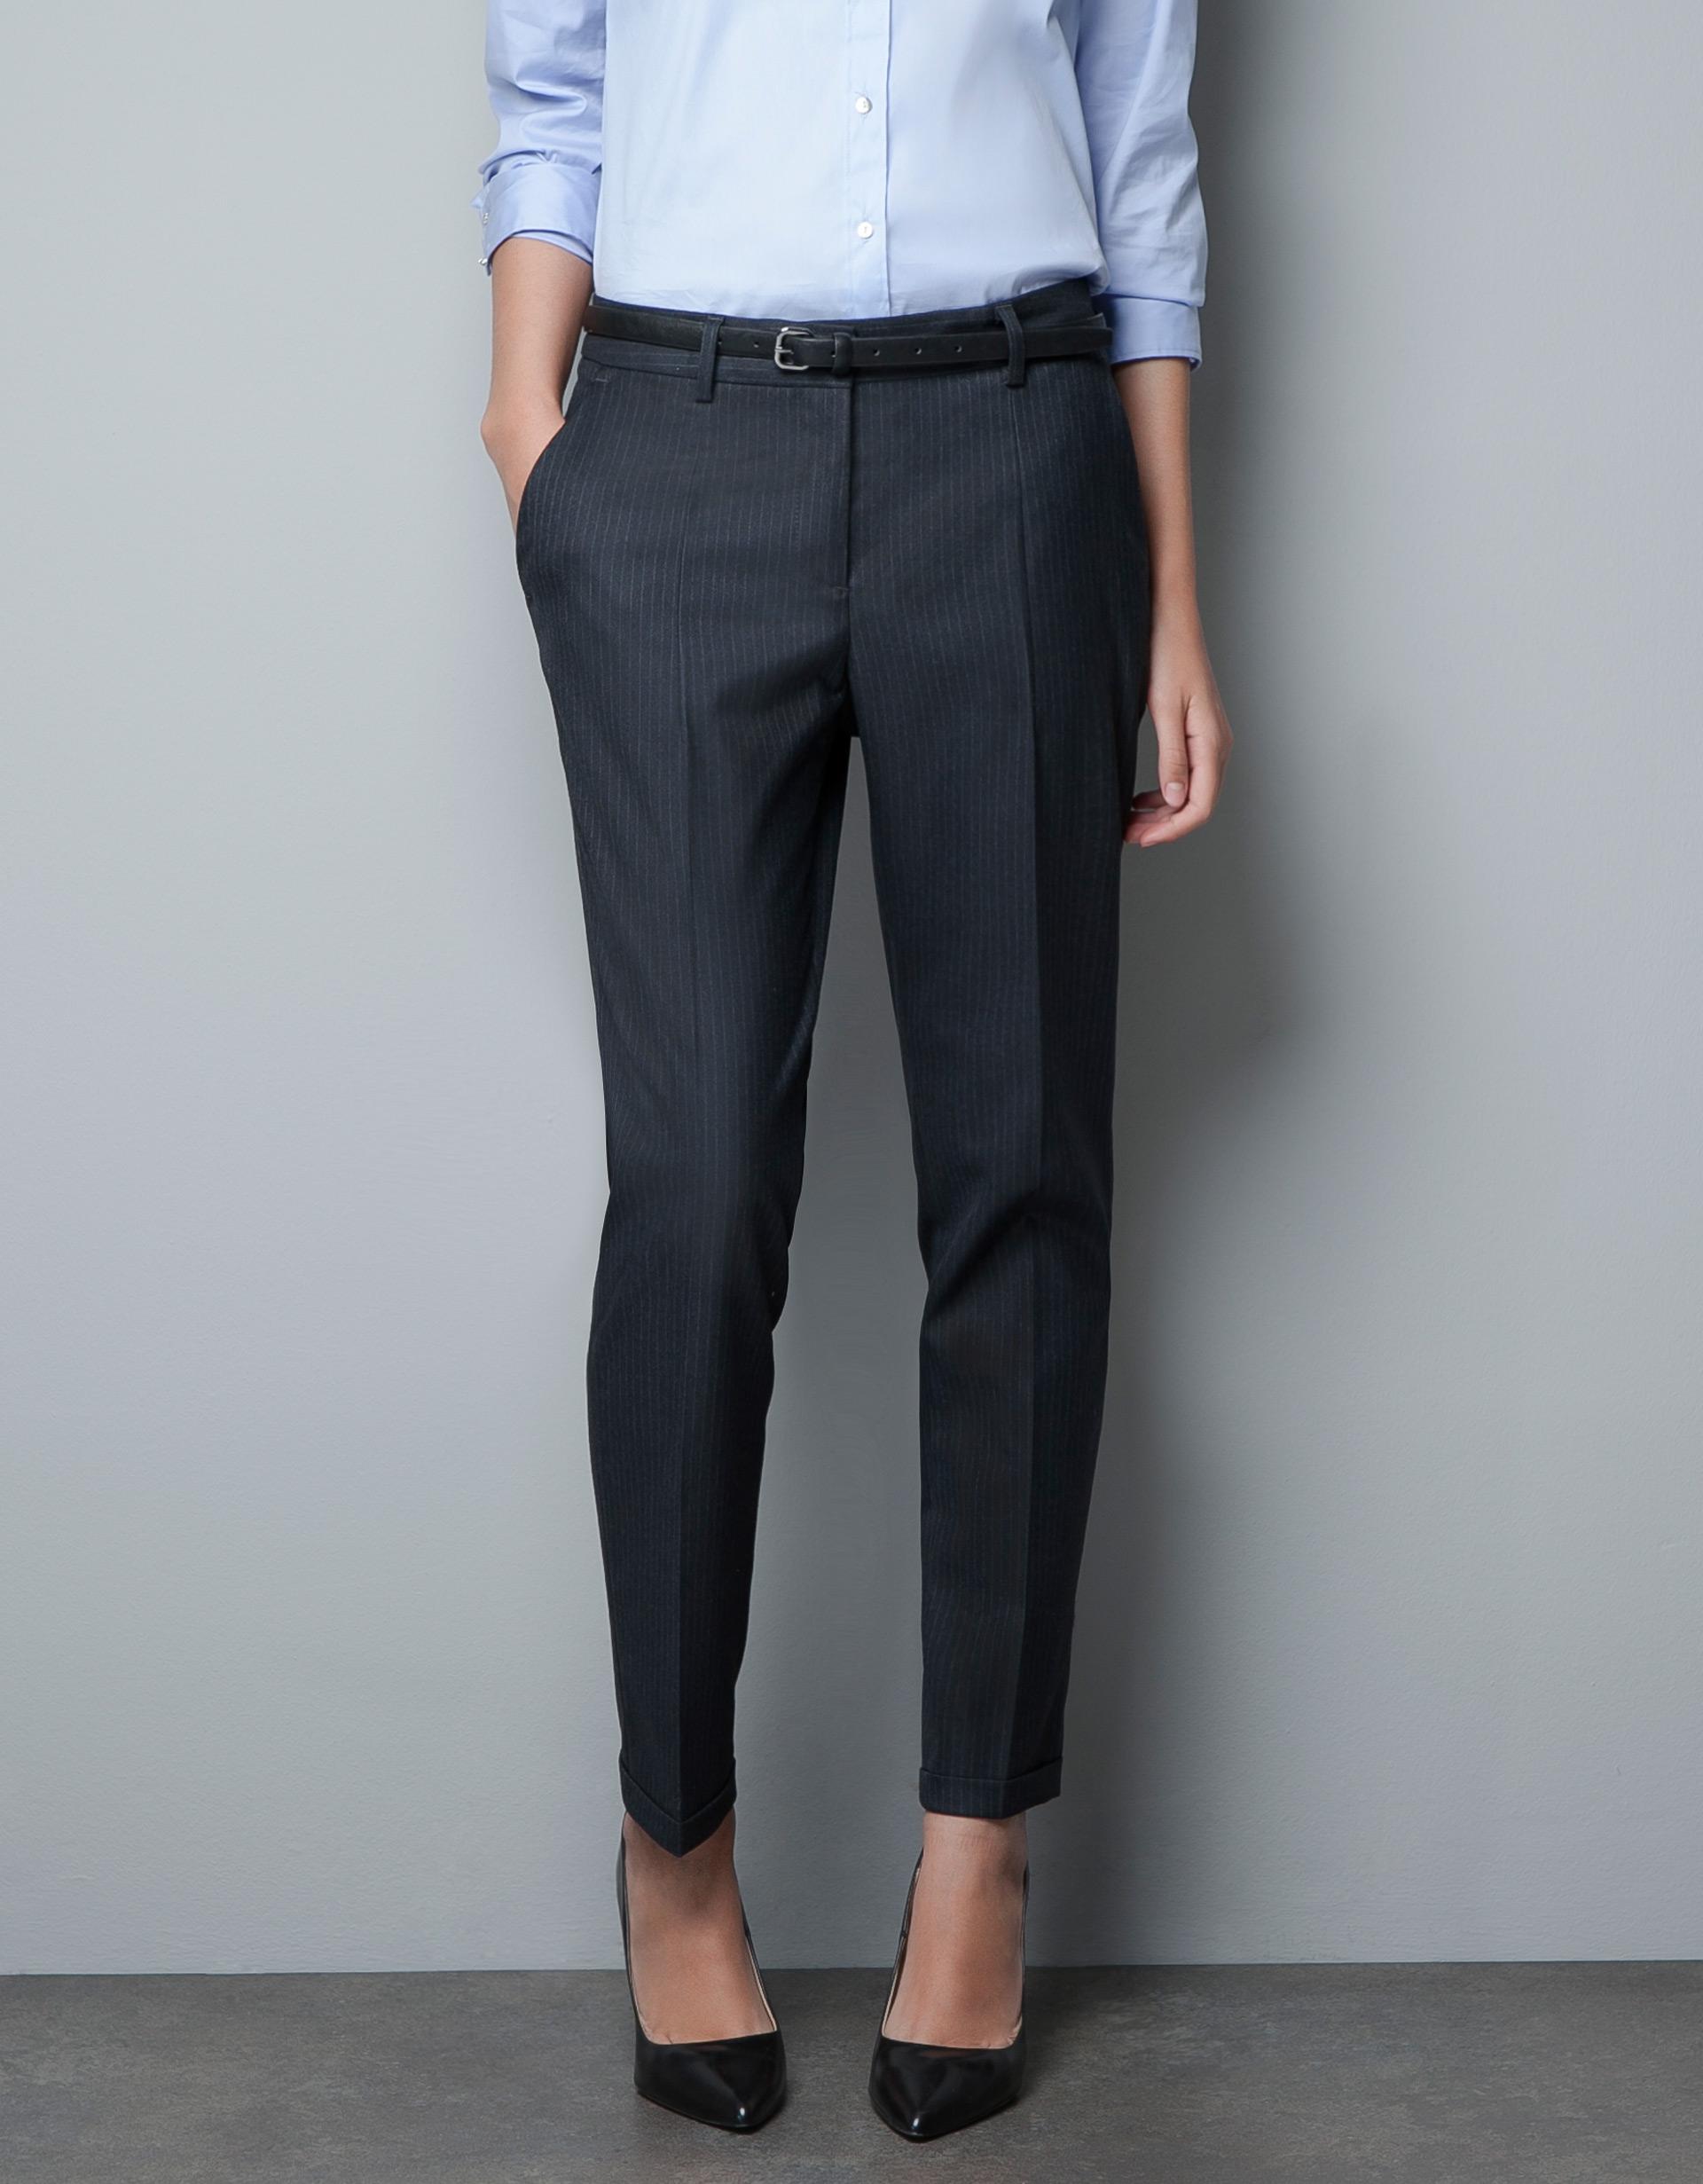 Zara Trousers For Women Related Keywords - Zara Trousers For Women Long Tail Keywords KeywordsKing